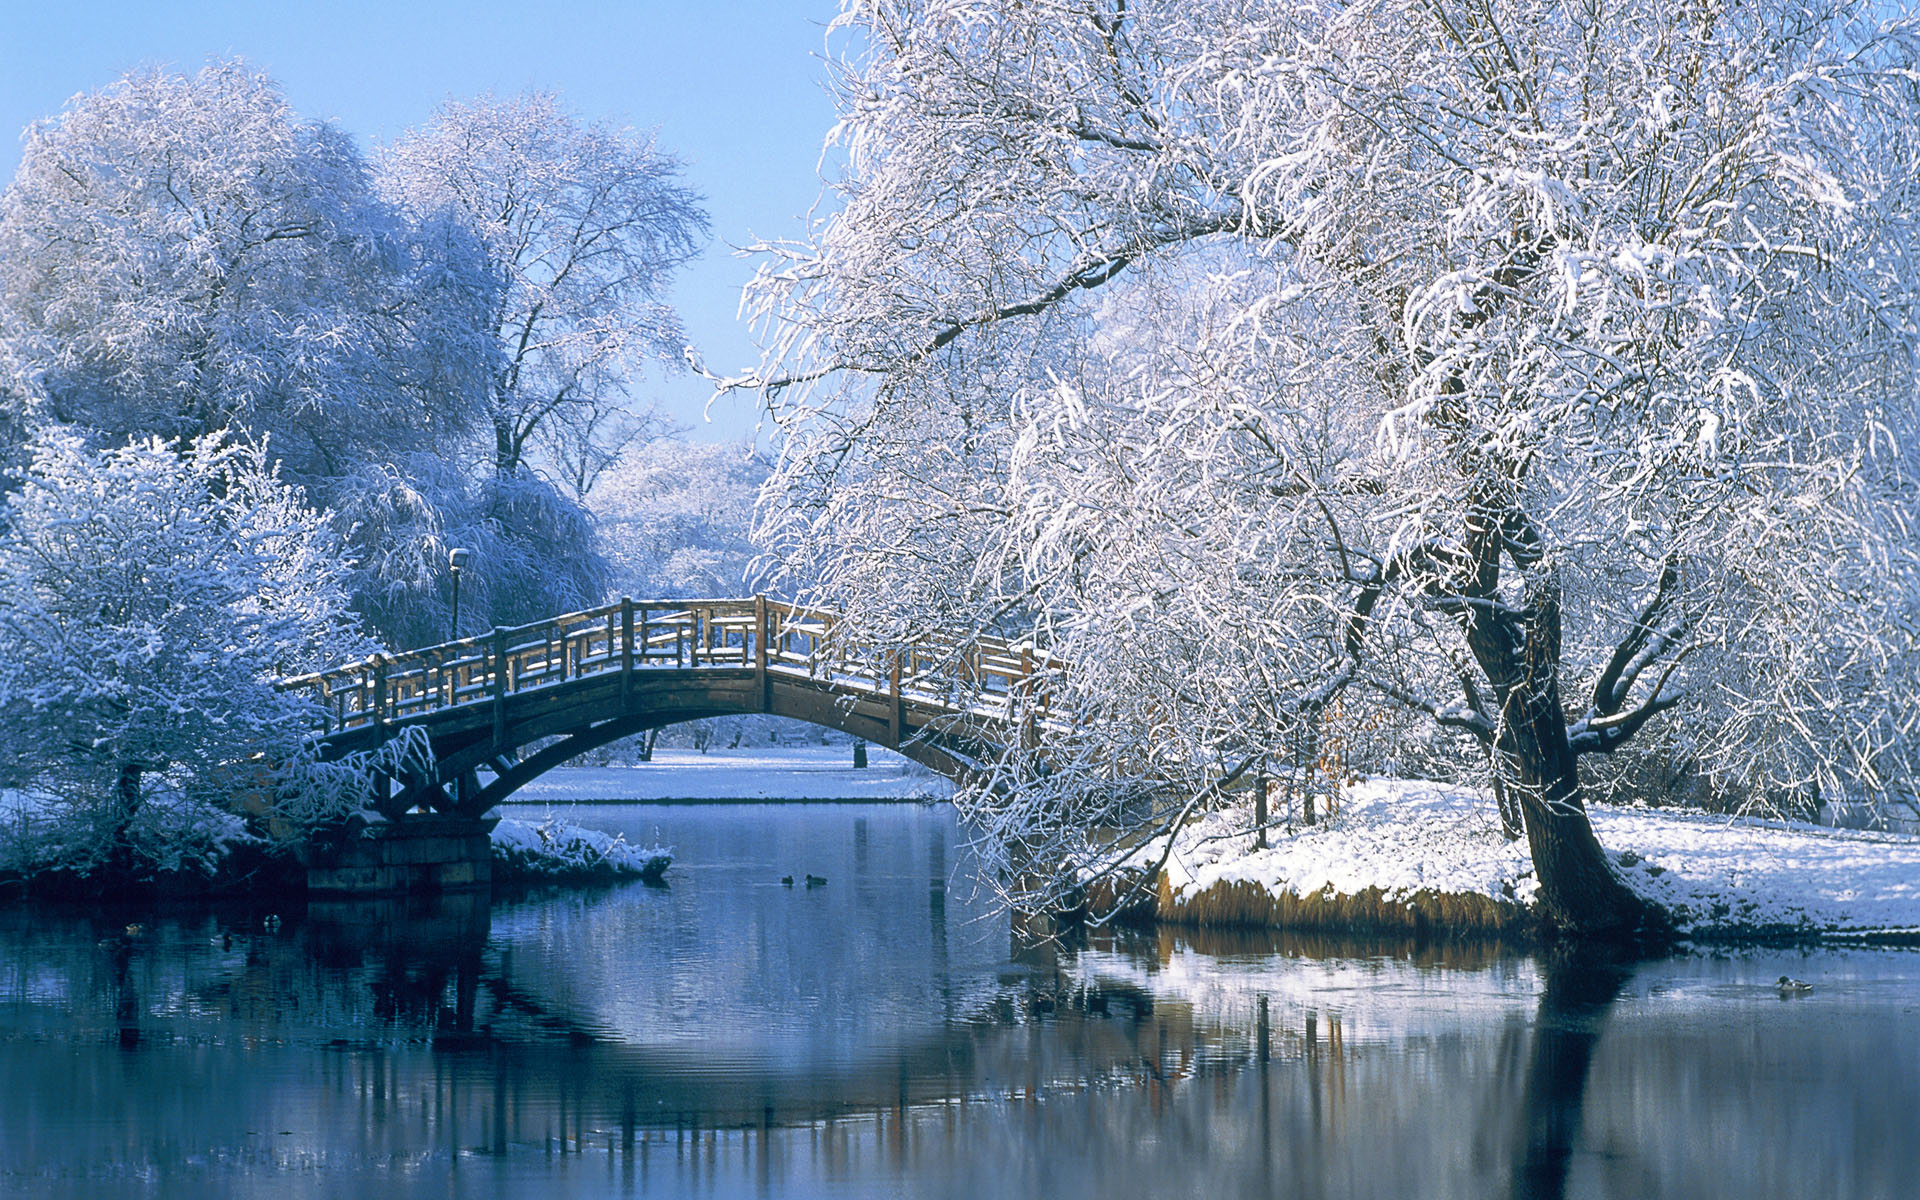 Bridge over a pond in the winter 33237